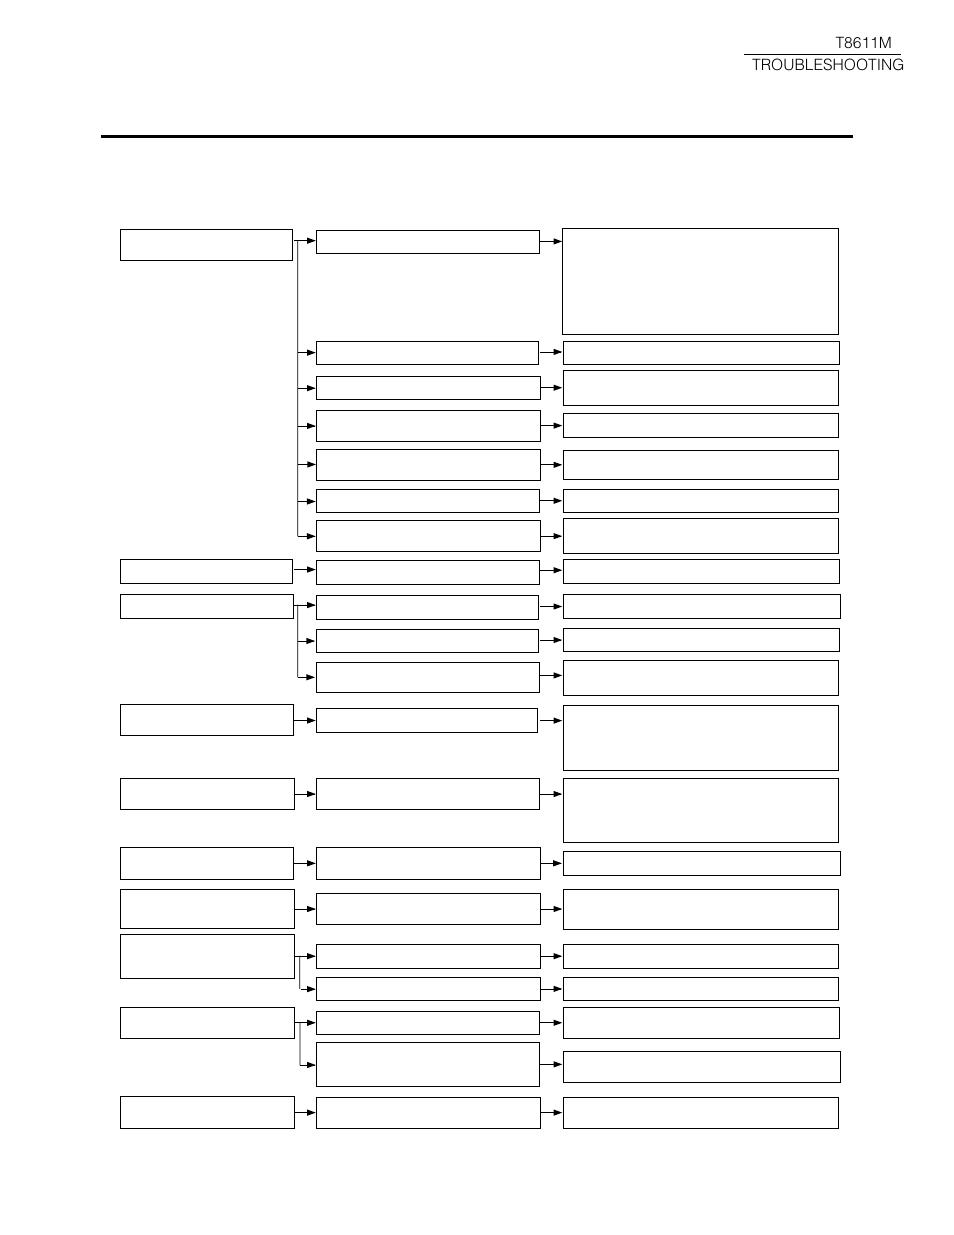 medium resolution of troubleshooting honeywell chronotherm iii t8611m user manual page 29 32